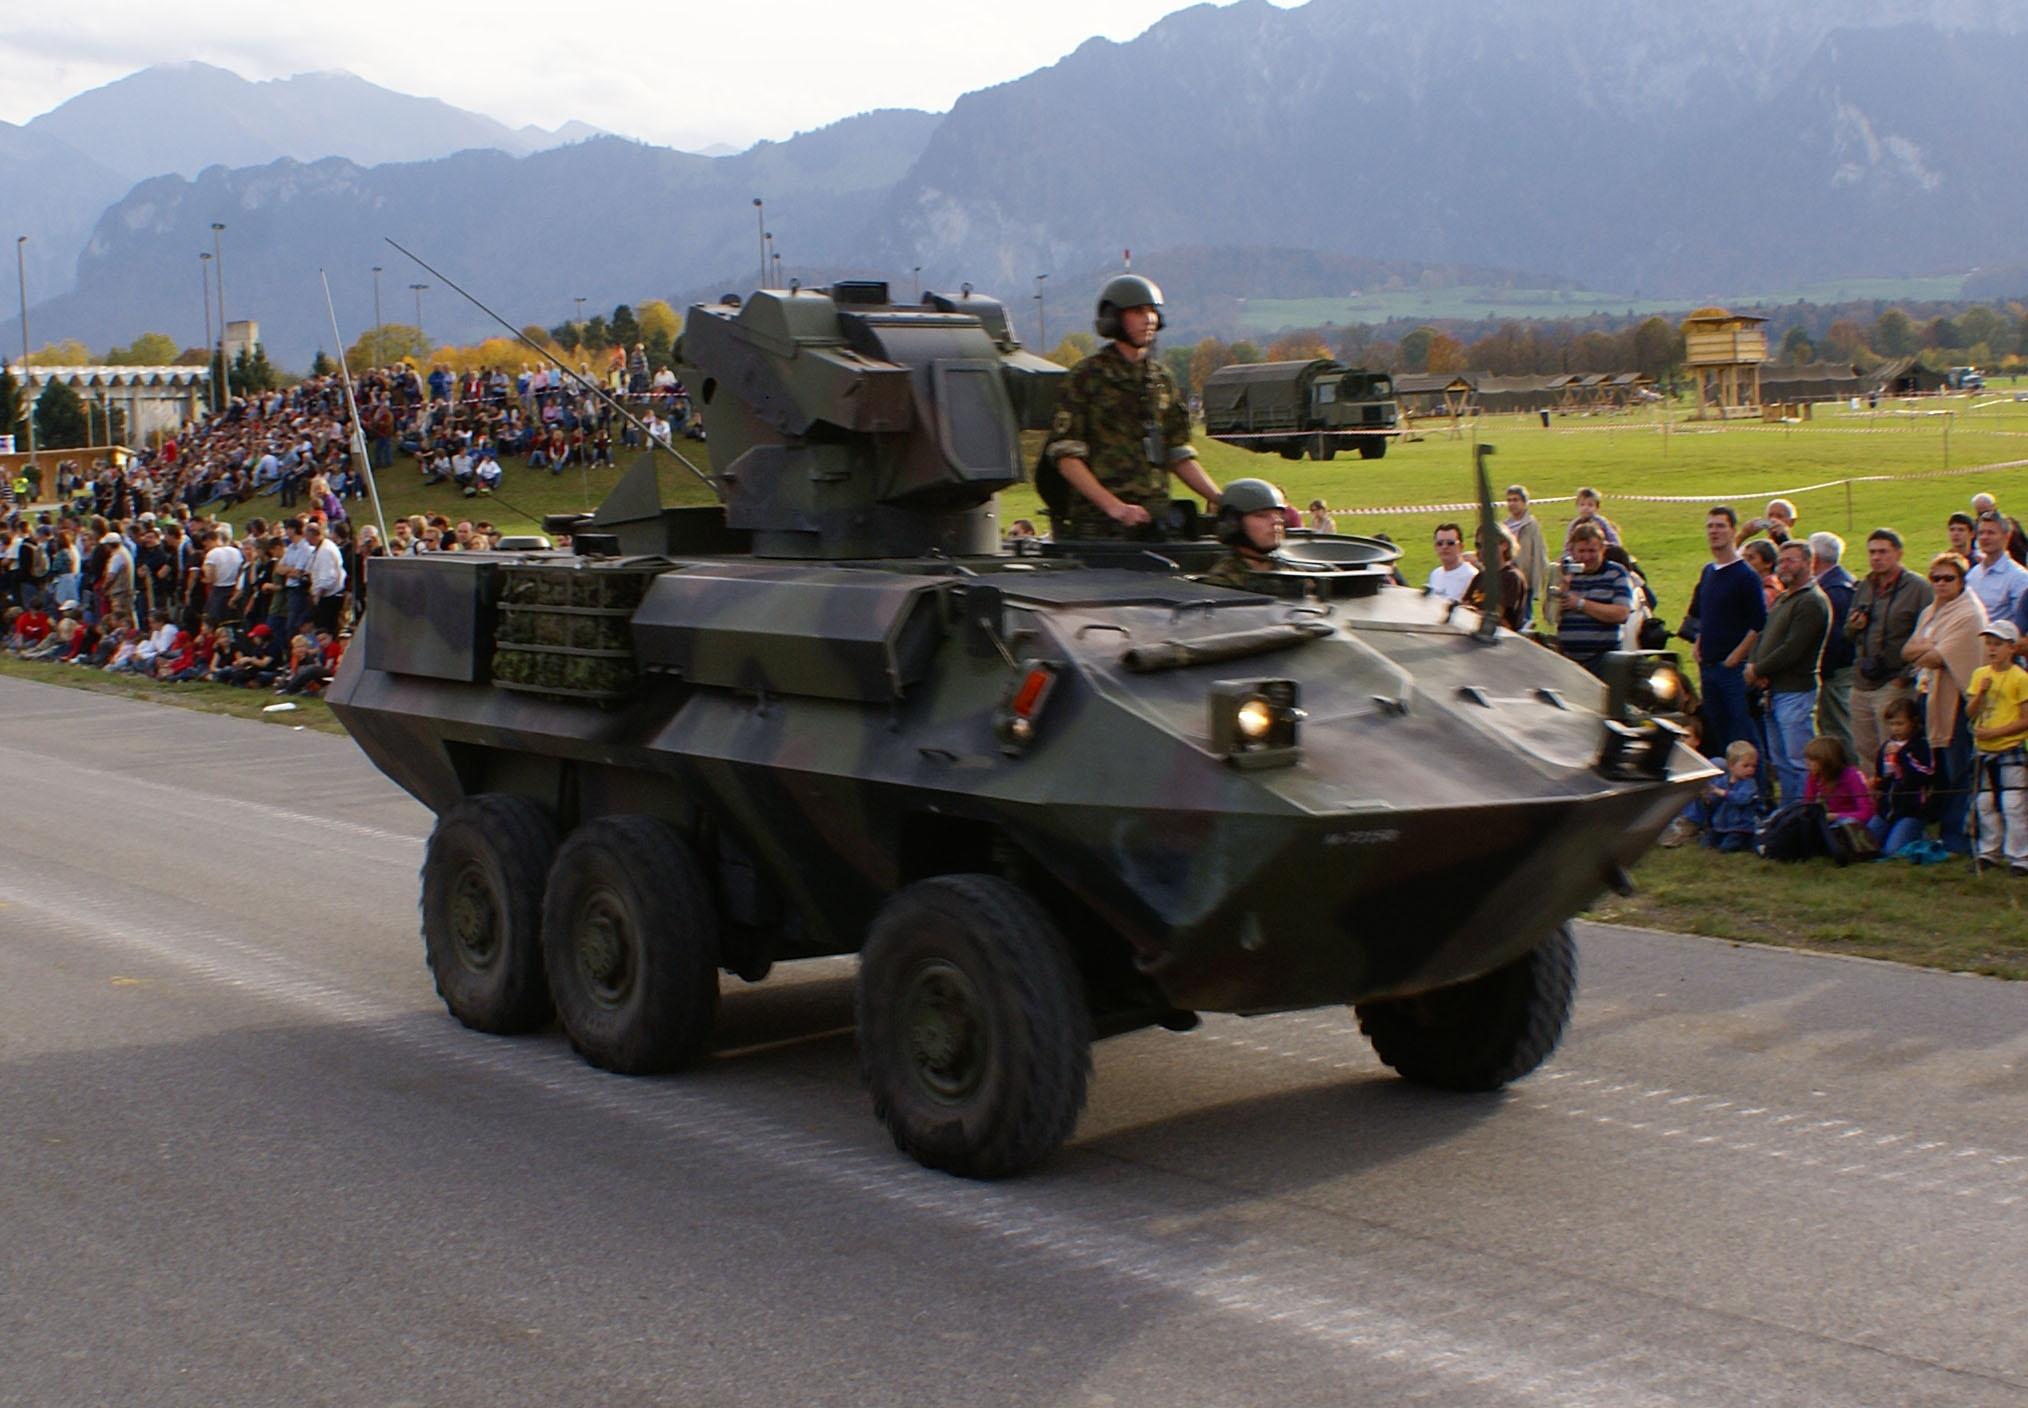 Armed Forces Car Show La Crsencta